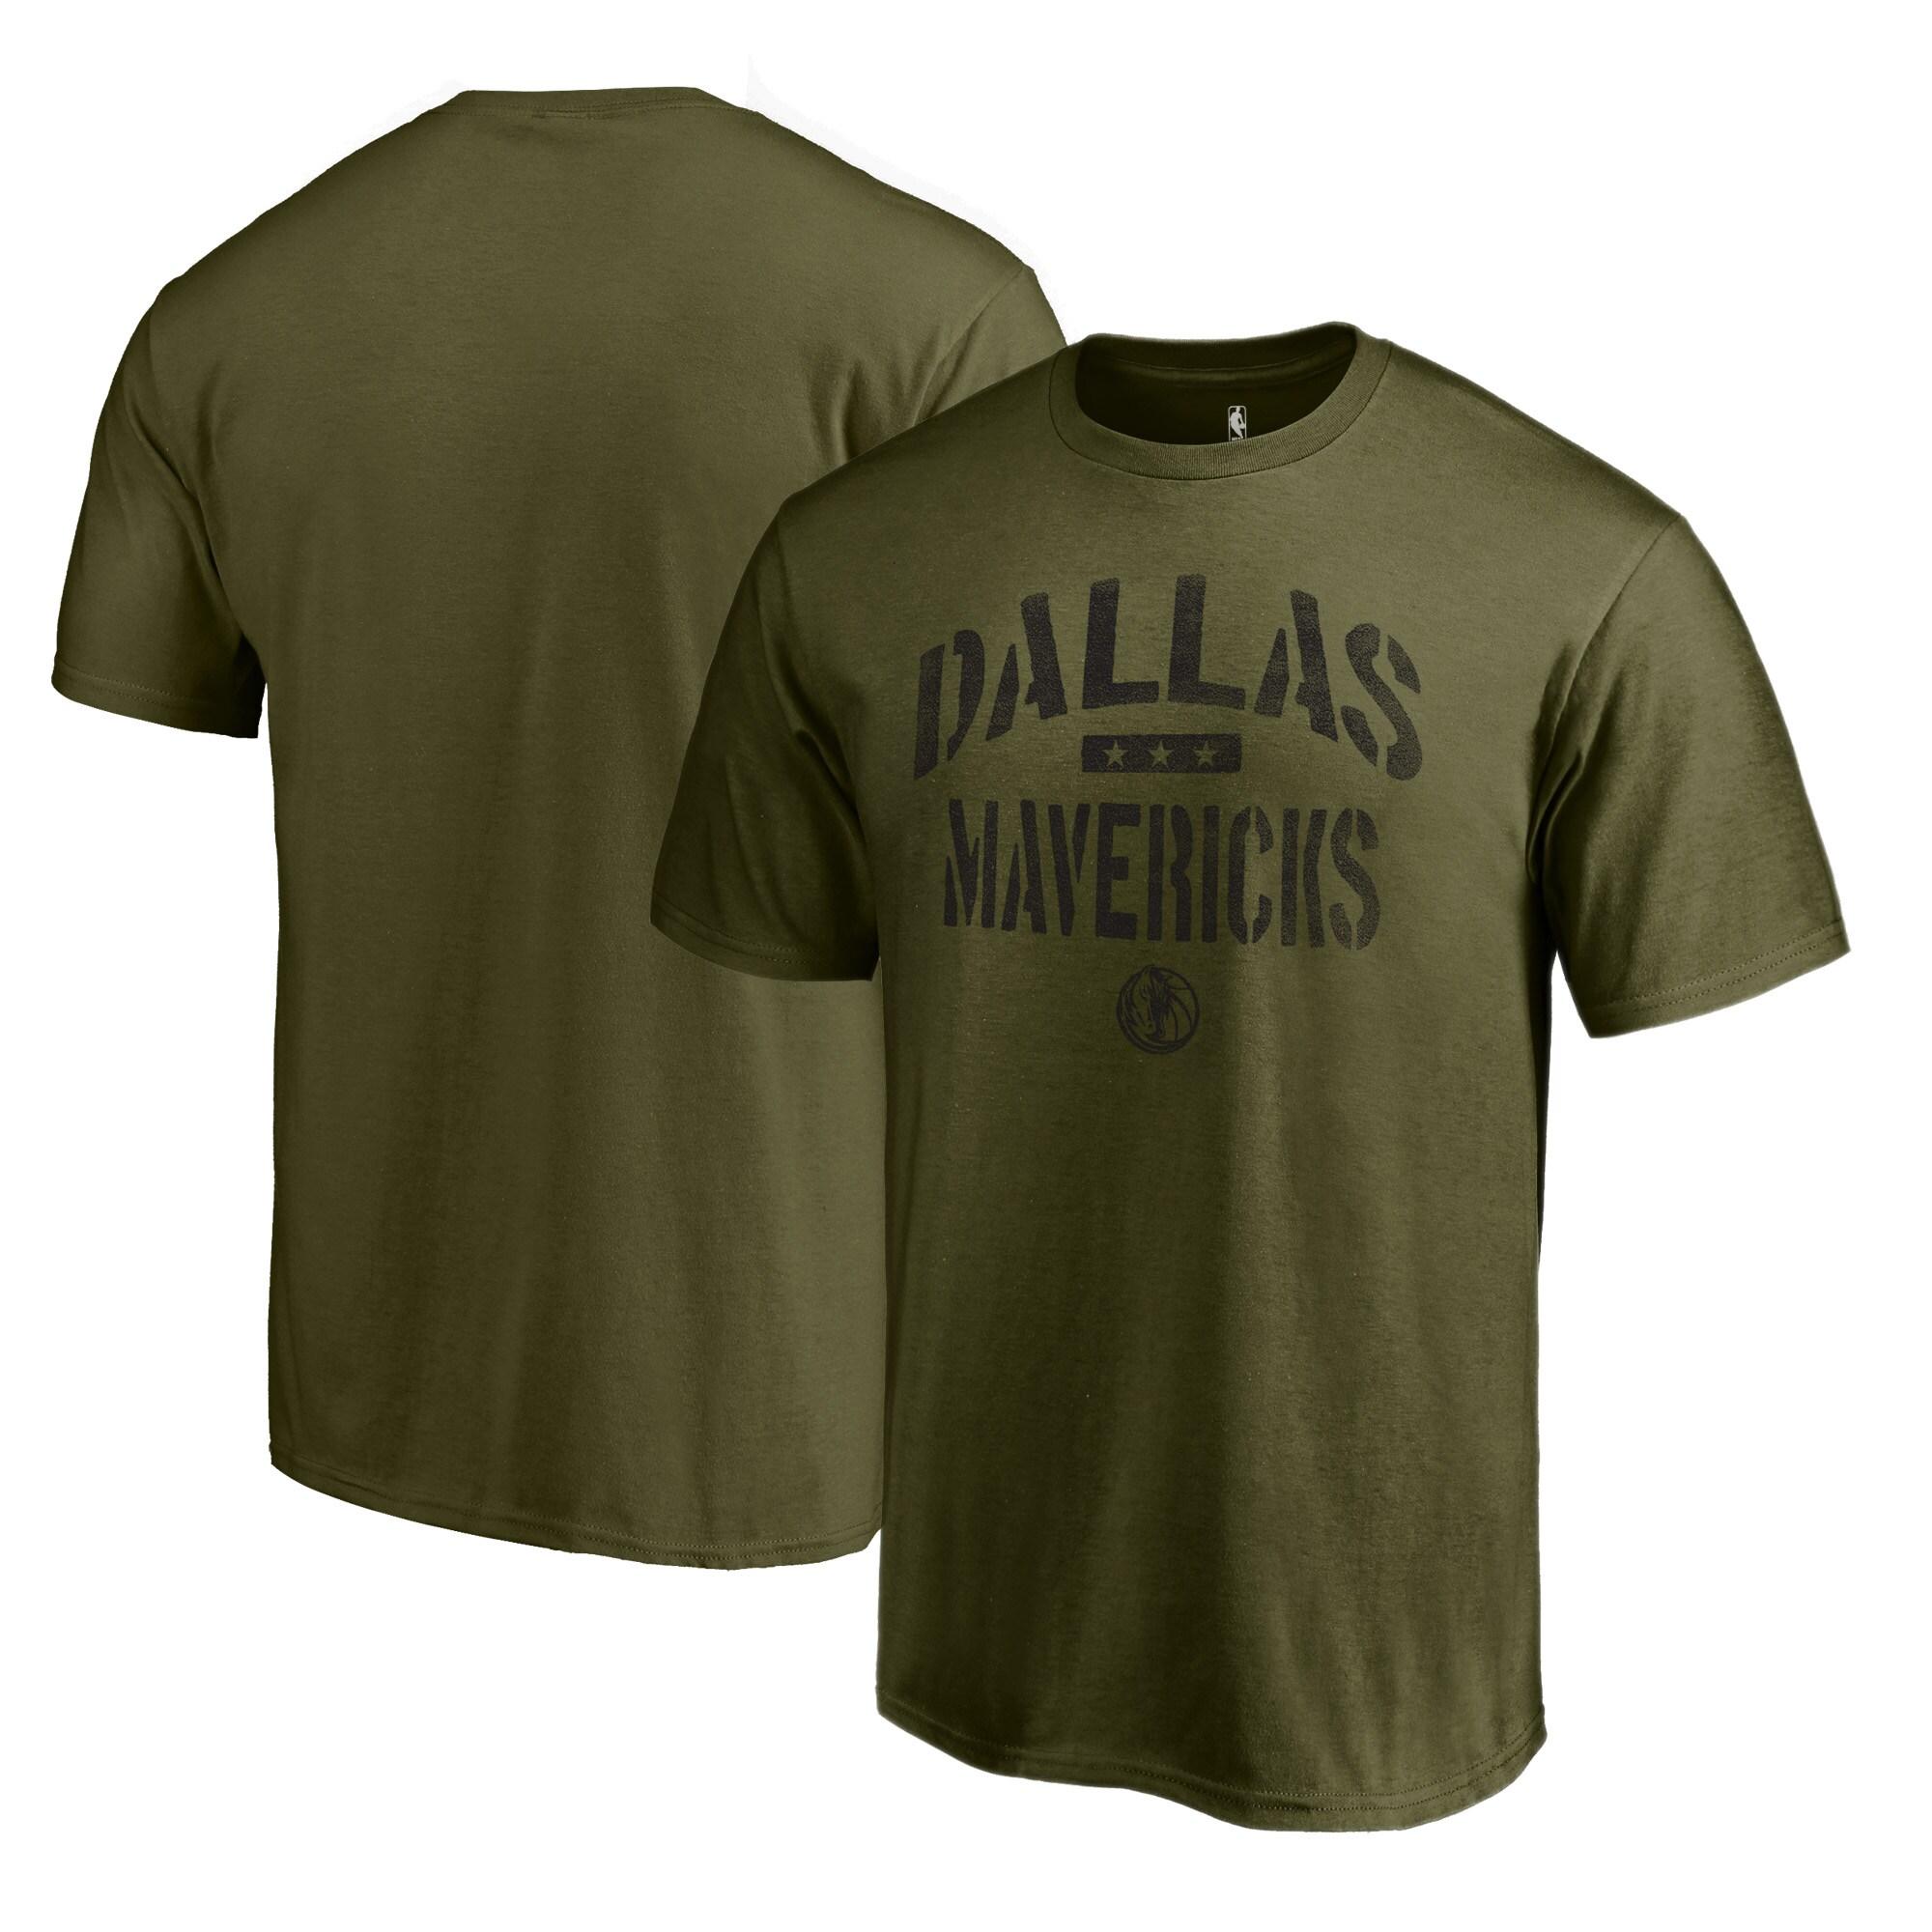 Dallas Mavericks Fanatics Branded Camo Collection Jungle T-Shirt - Green